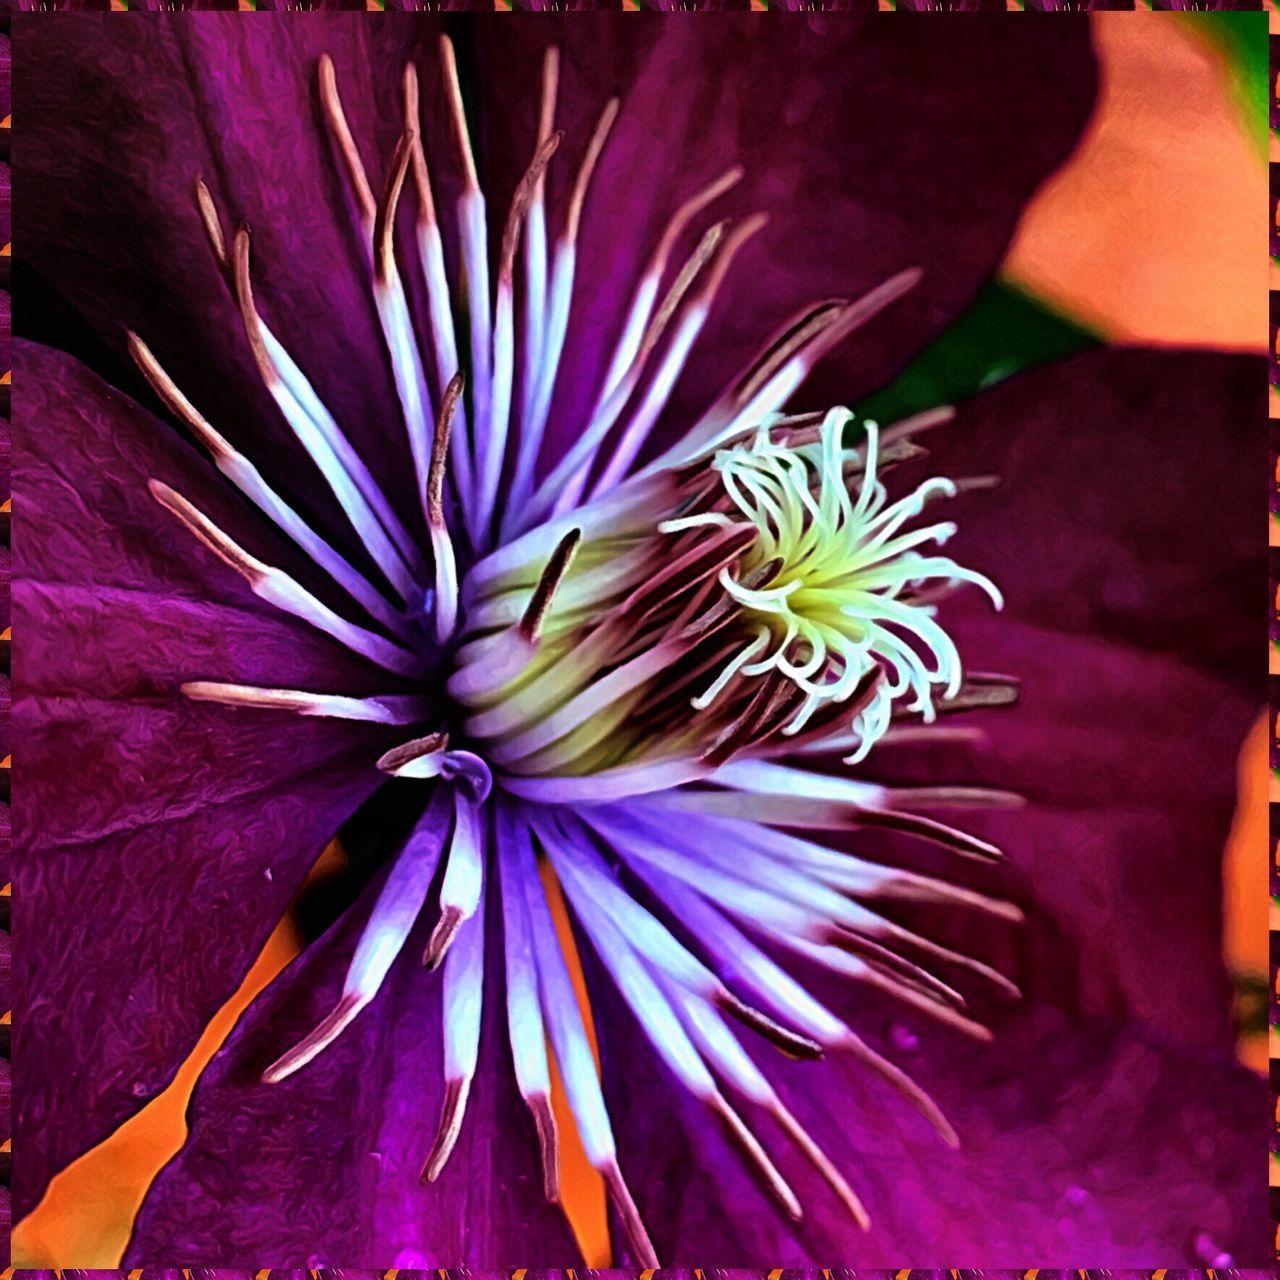 Enjoying a little leftover beauty from summer. Flower Fragility Petal Flower Head Beauty In Nature Close-up Plant In Bloom Stamen Purple Vibrant Color Clematis Nature Clematis Flower PNW